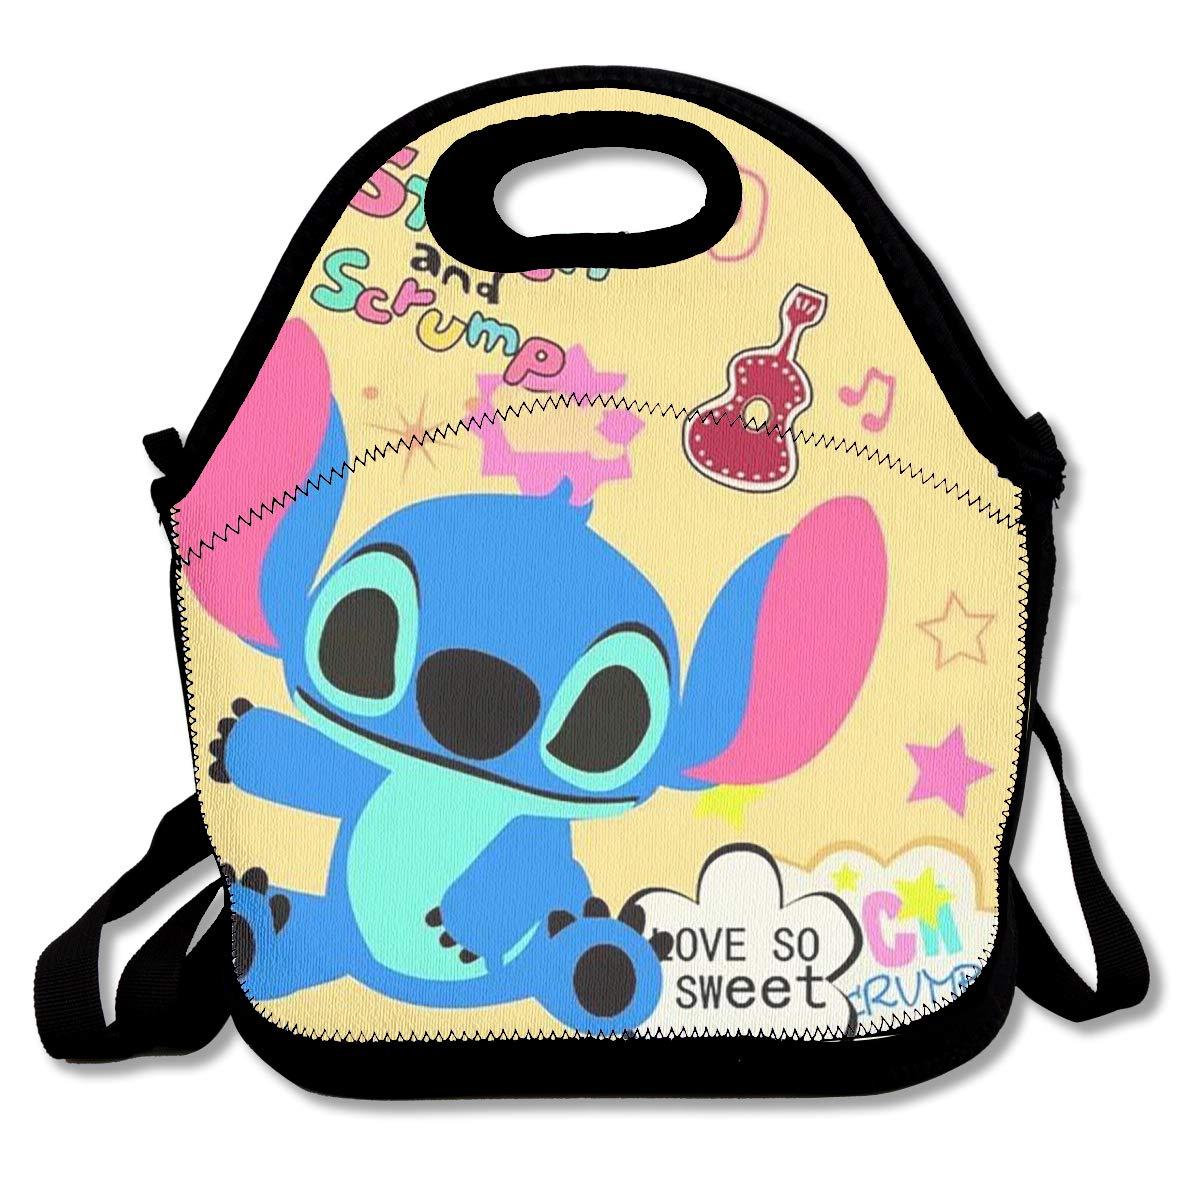 26fd8521cac9 Amazon.com - LIUYAN Personalized Bento Lunch Box So Sweet Stitch ...